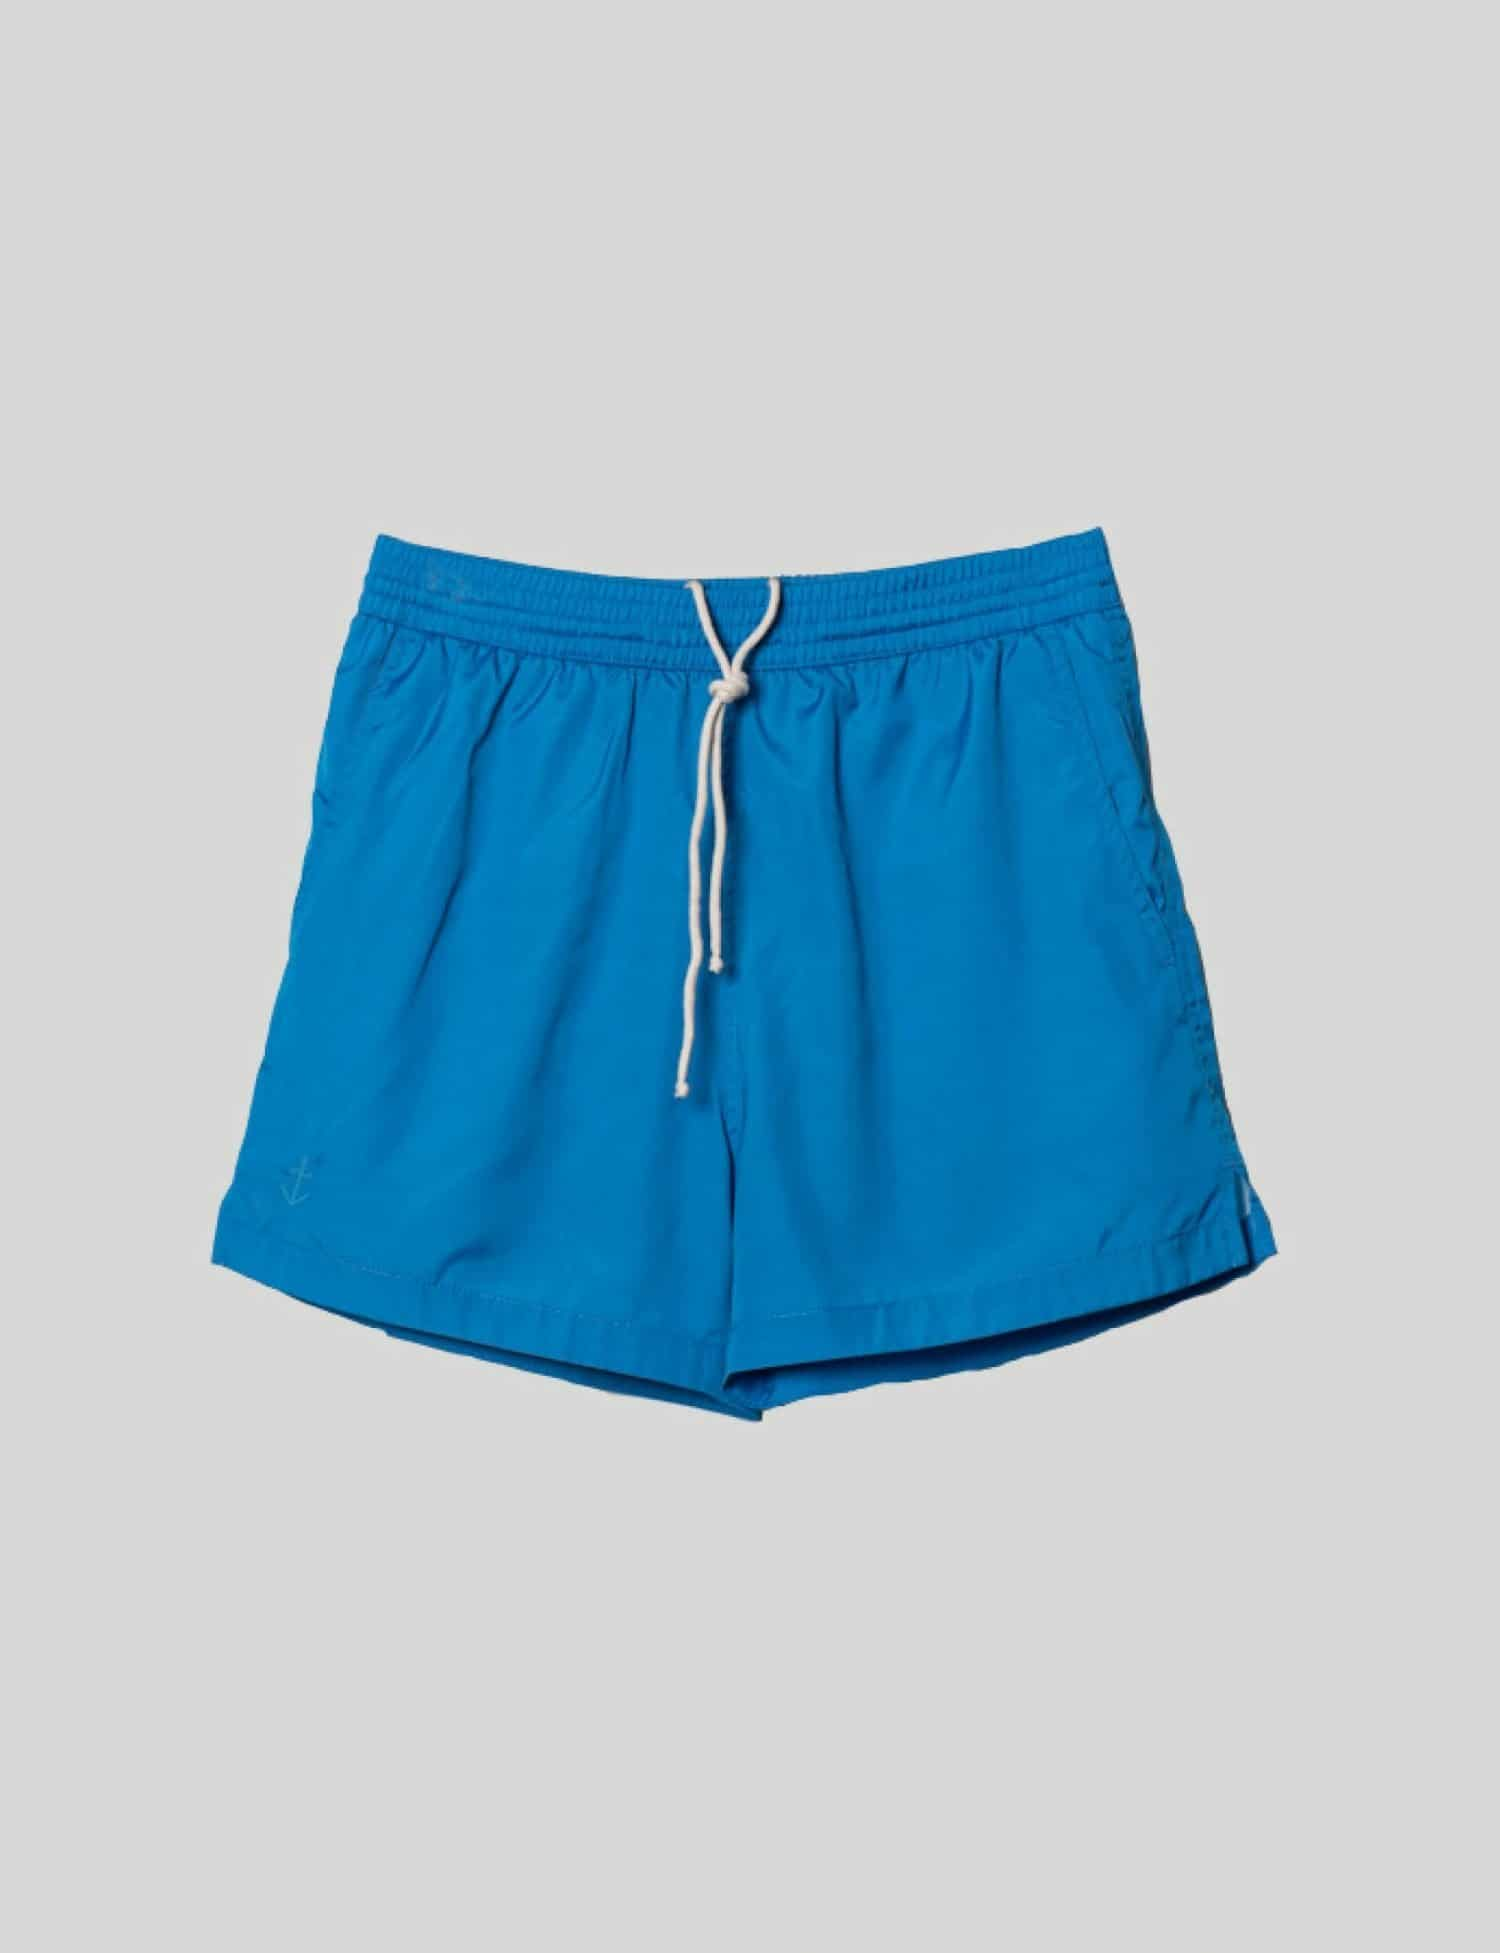 Castart - La Paz - Morais Swim Shorts - French Blue